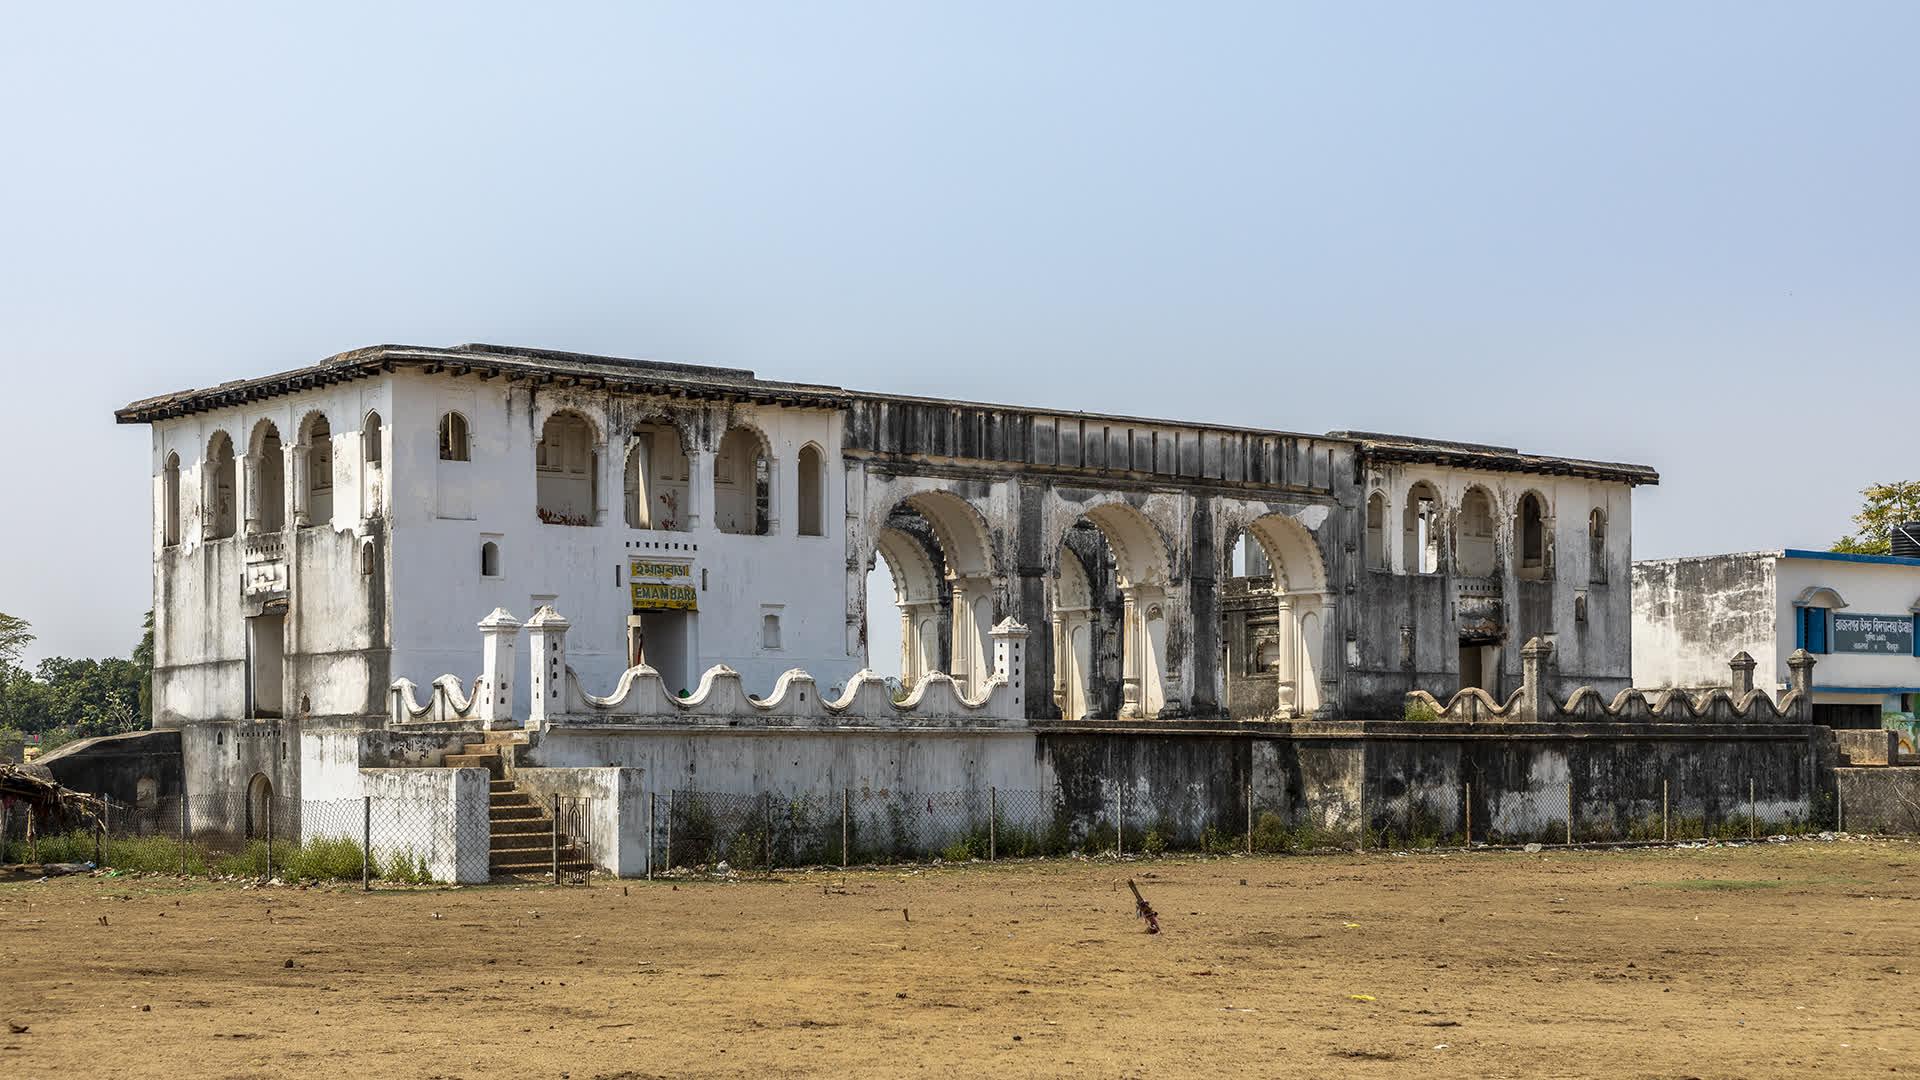 Rajnagar Imambara